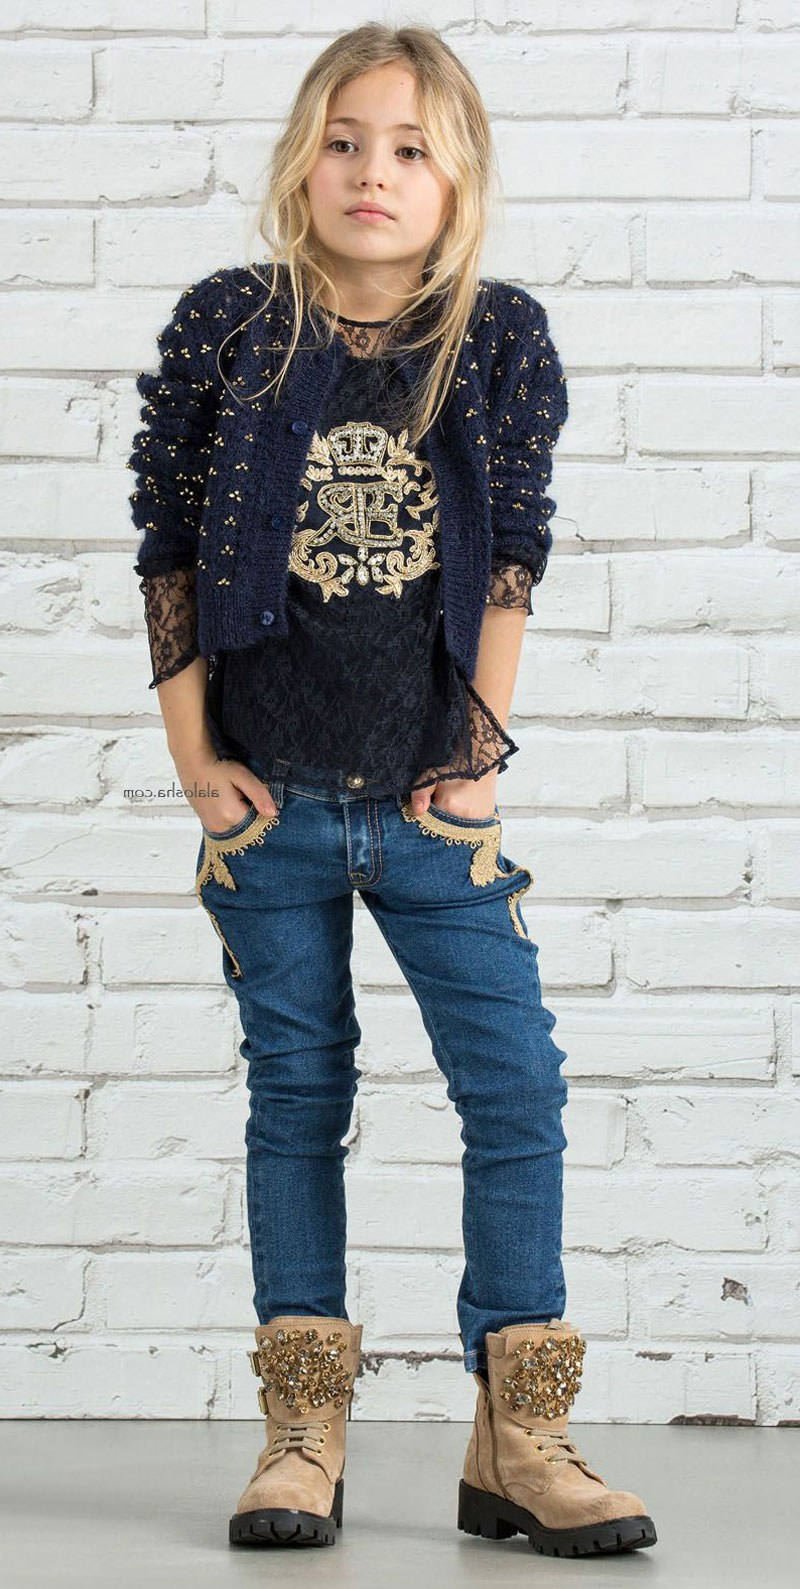 Design Model Baju Lebaran 2019 Anak Perempuan Kvdd 60 Model Baju Anak Perempuan Terbaru 2019 Ootd 2019 Hits